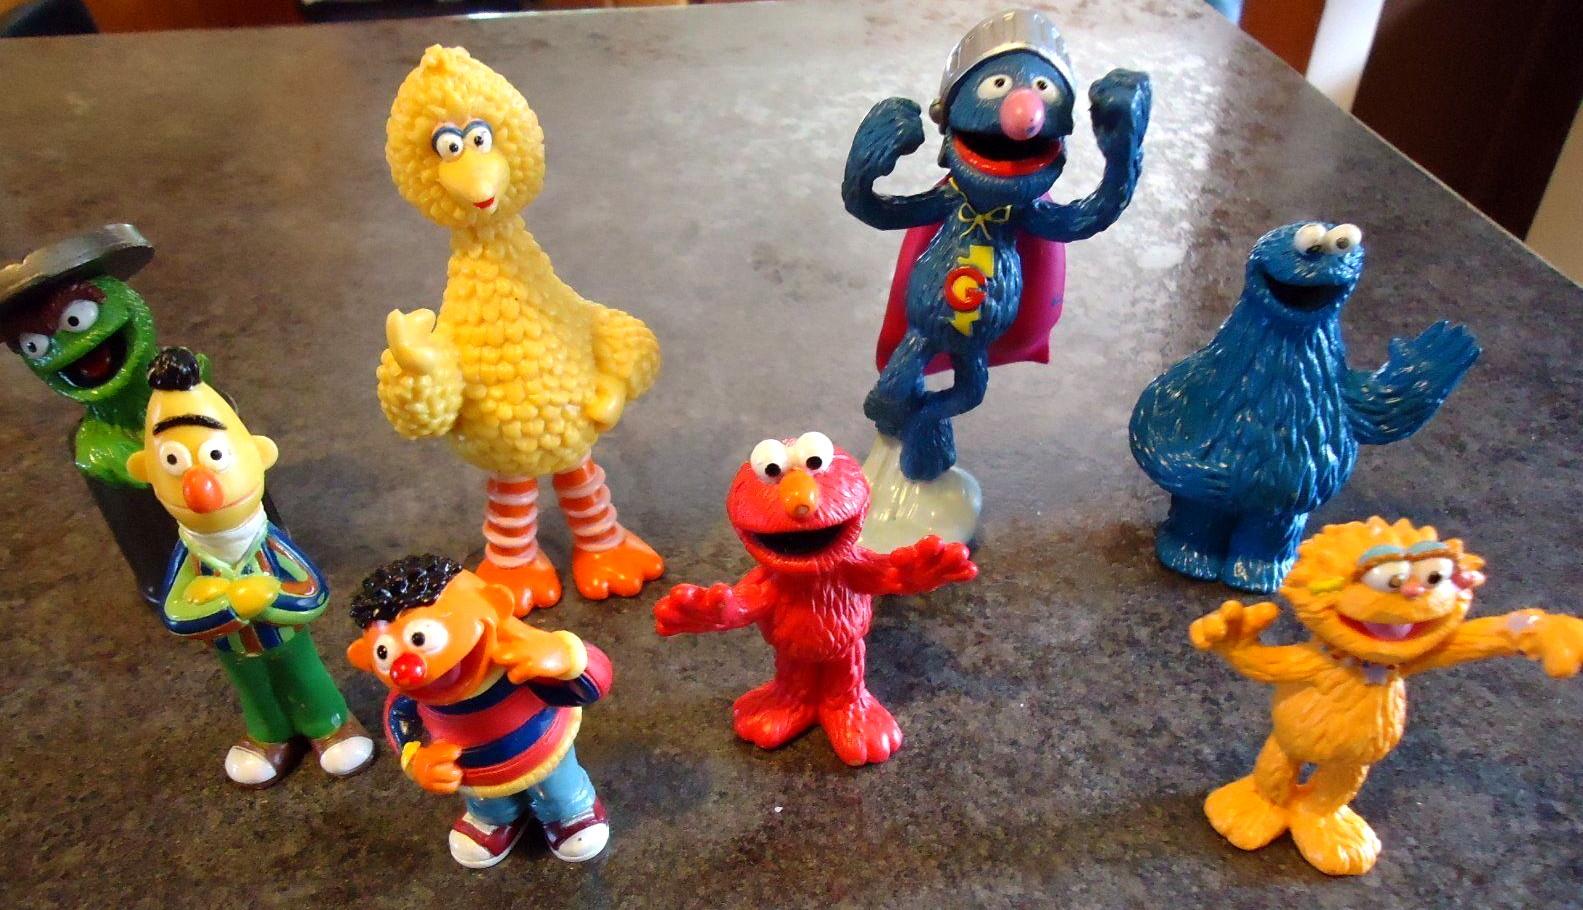 Sesame Street Live Playset | Muppet Wiki | FANDOM powered by